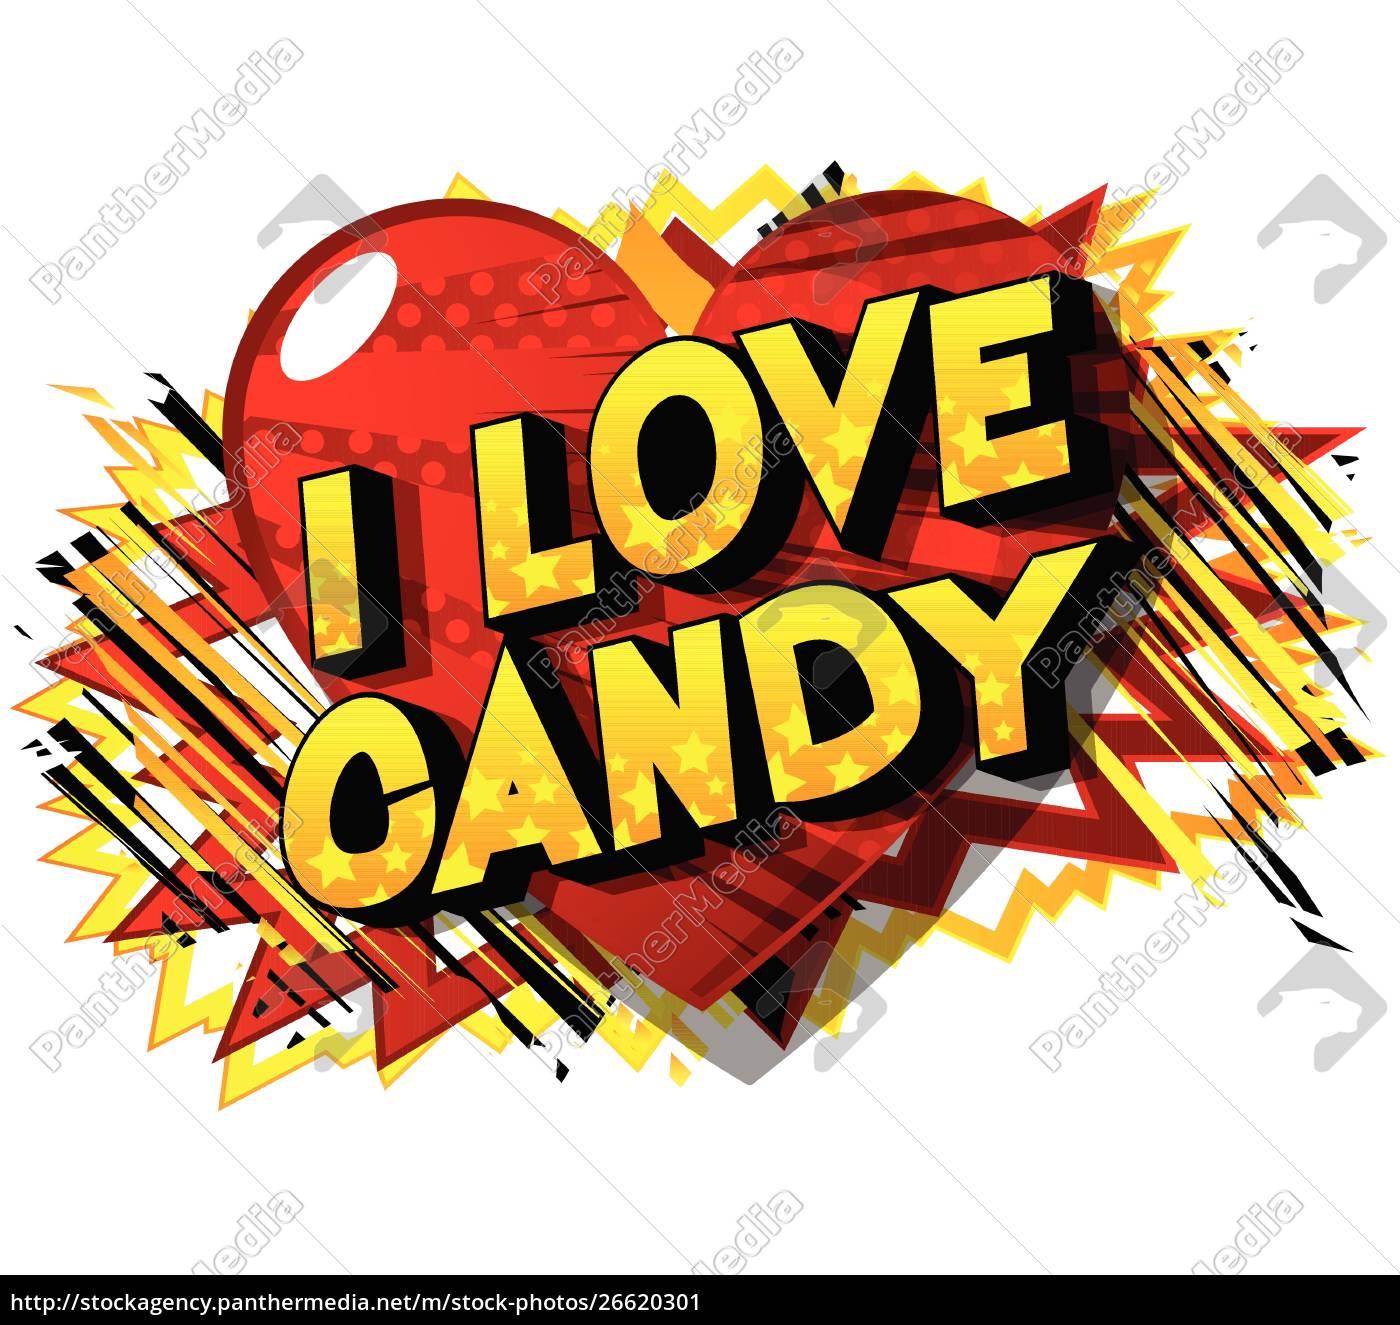 i, love, candy, -, comic, book - 26620301